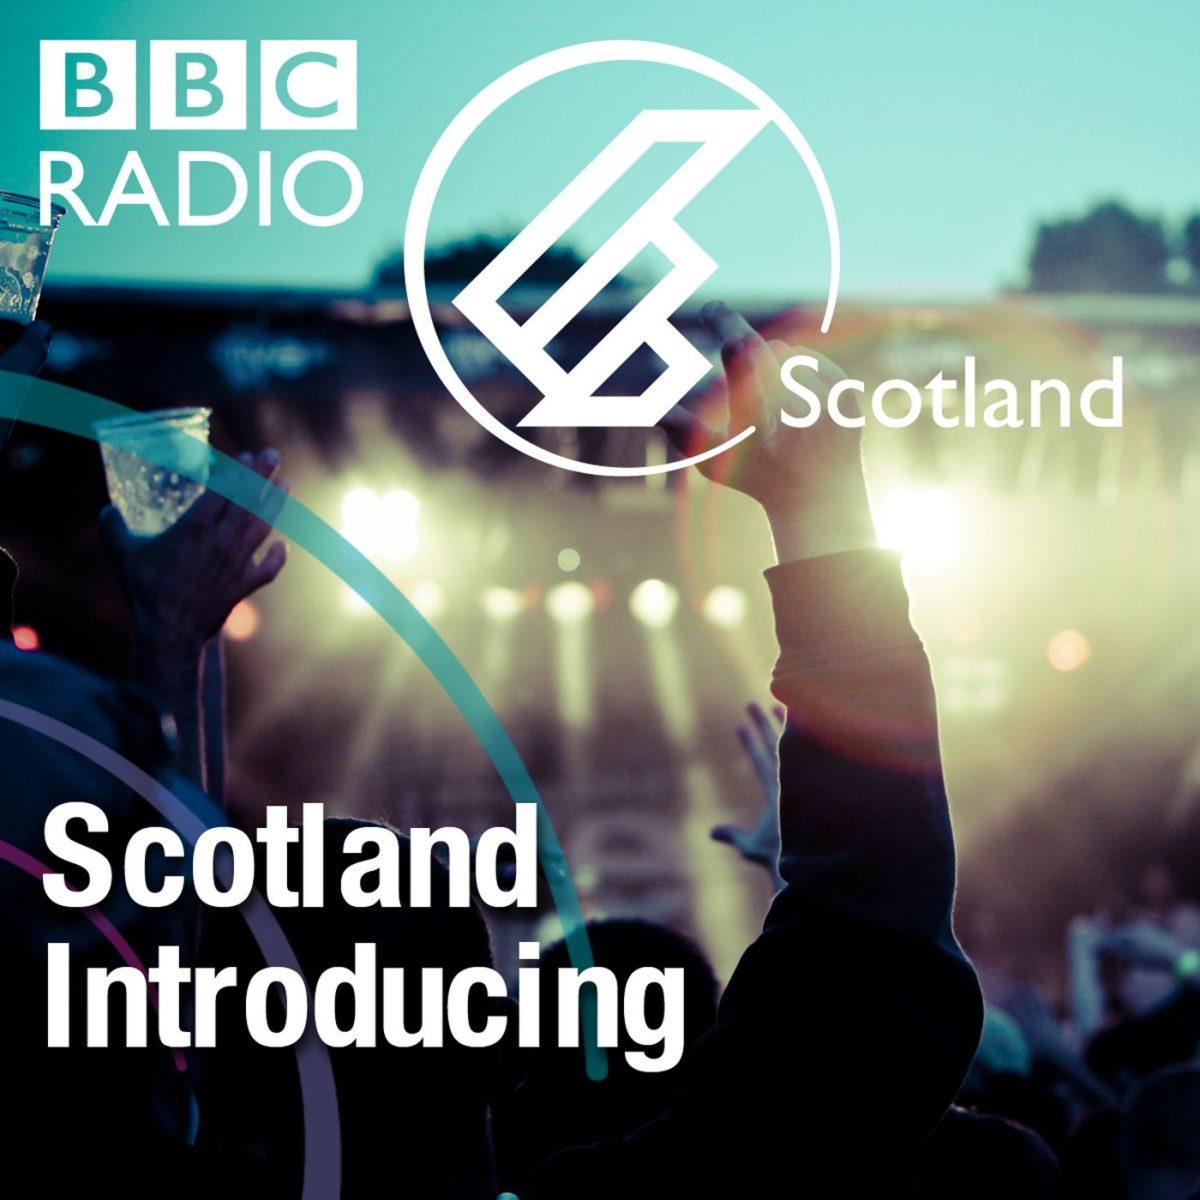 Scotland Introducing thumbnail, circa 2016